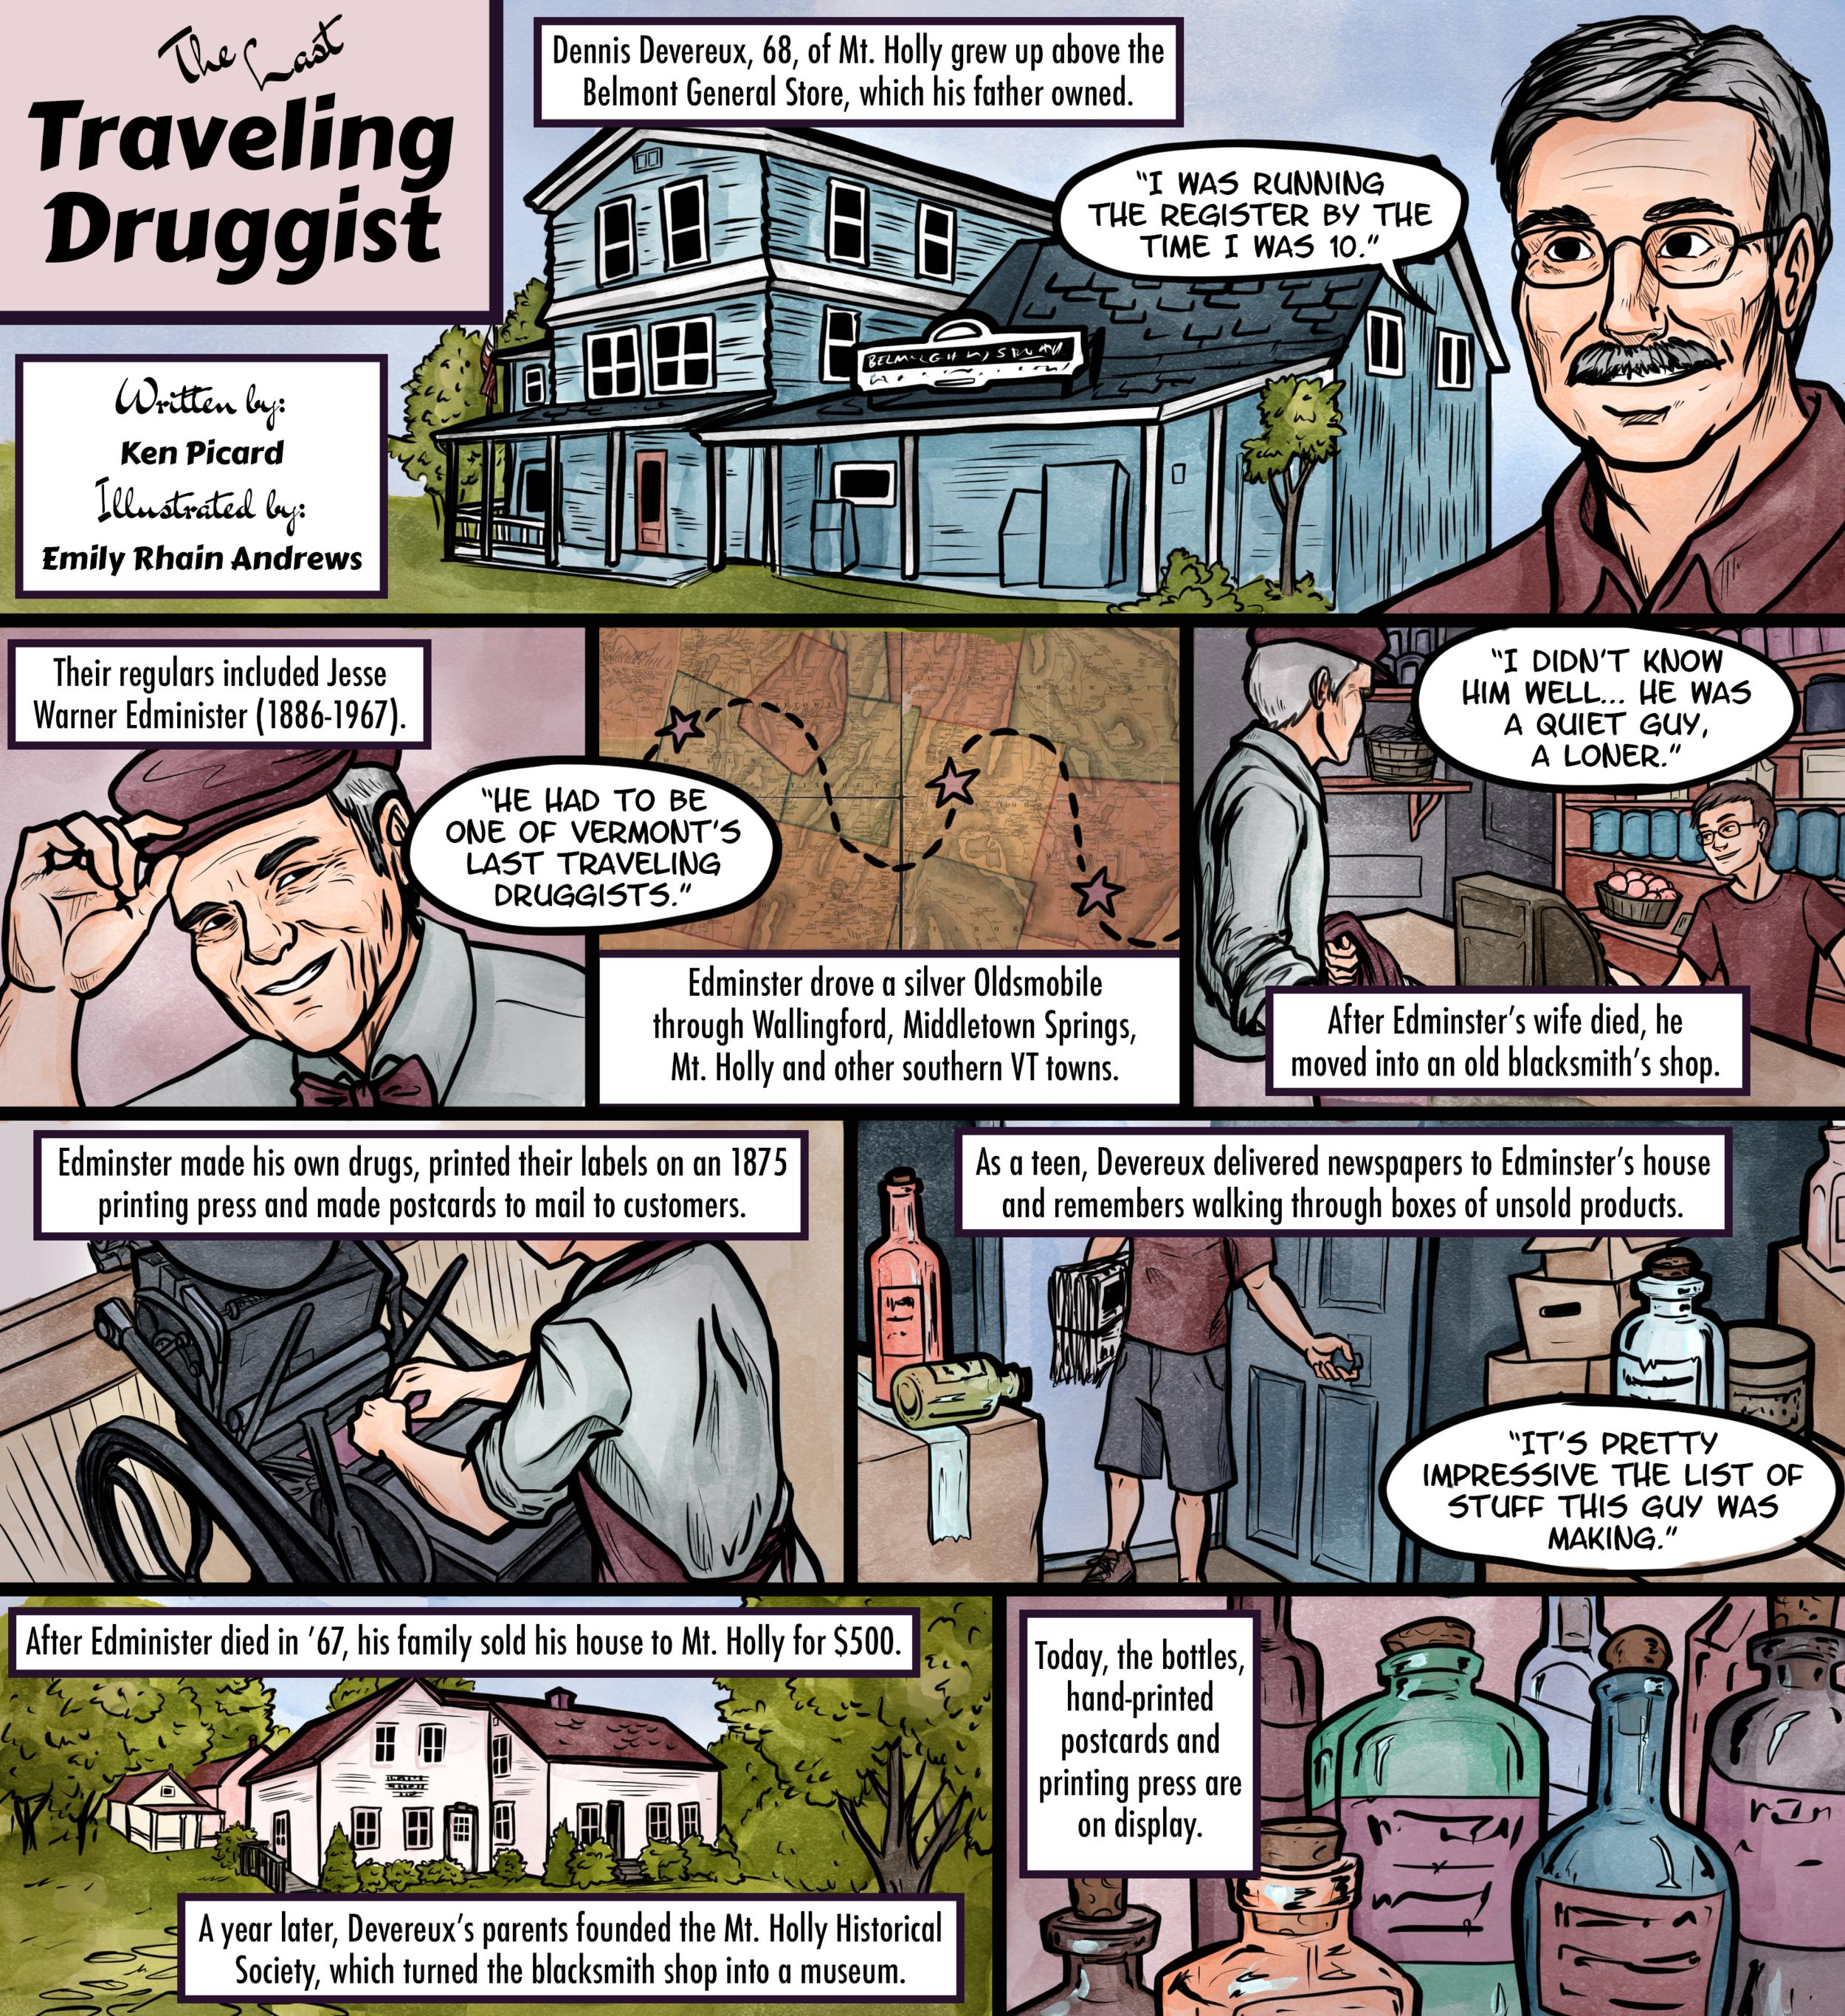 The Last Traveling Druggist